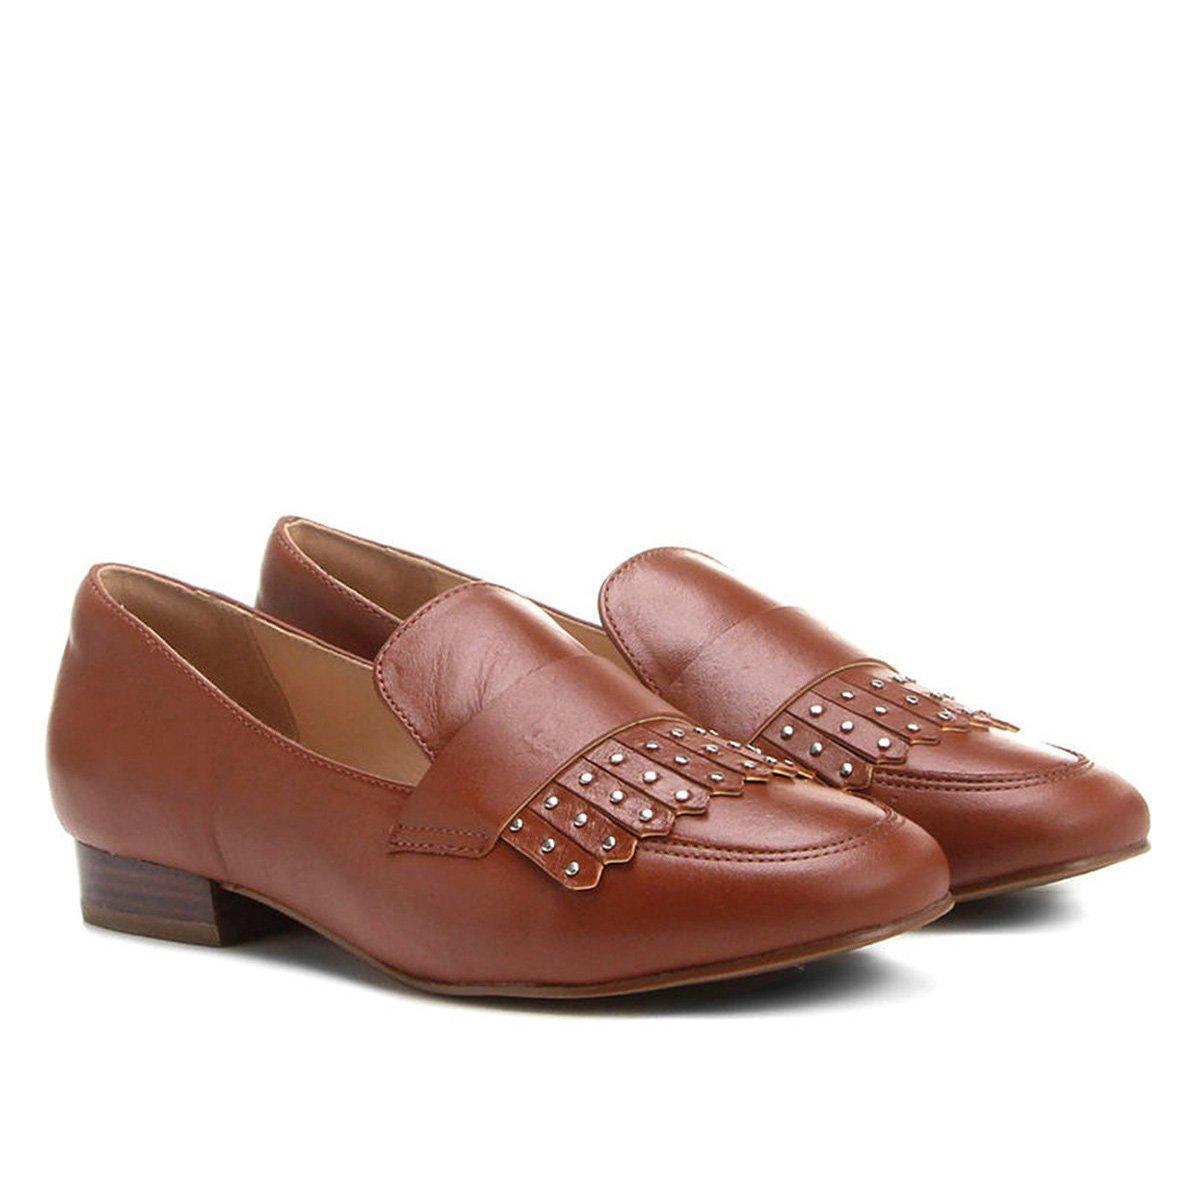 14ff5dd8bf Mocassim Couro Shoestock Franja Apliques Feminina